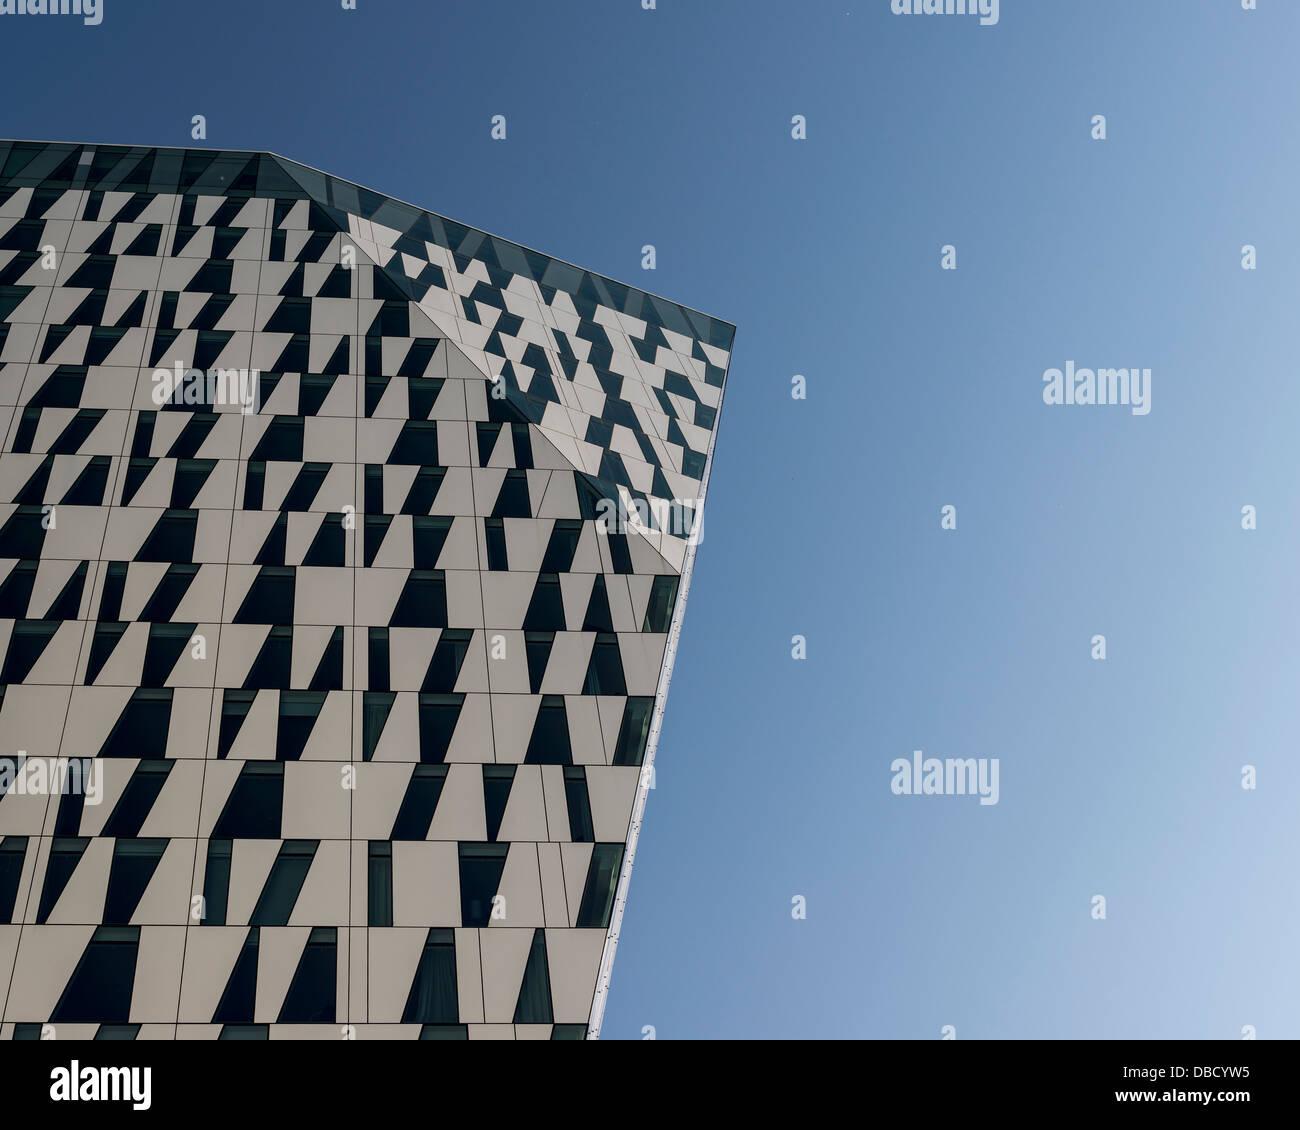 Bella Sky Hotel, Copenhagen, Denmark. Architect: 3XN, 2011. View of part of tower. Stock Photo